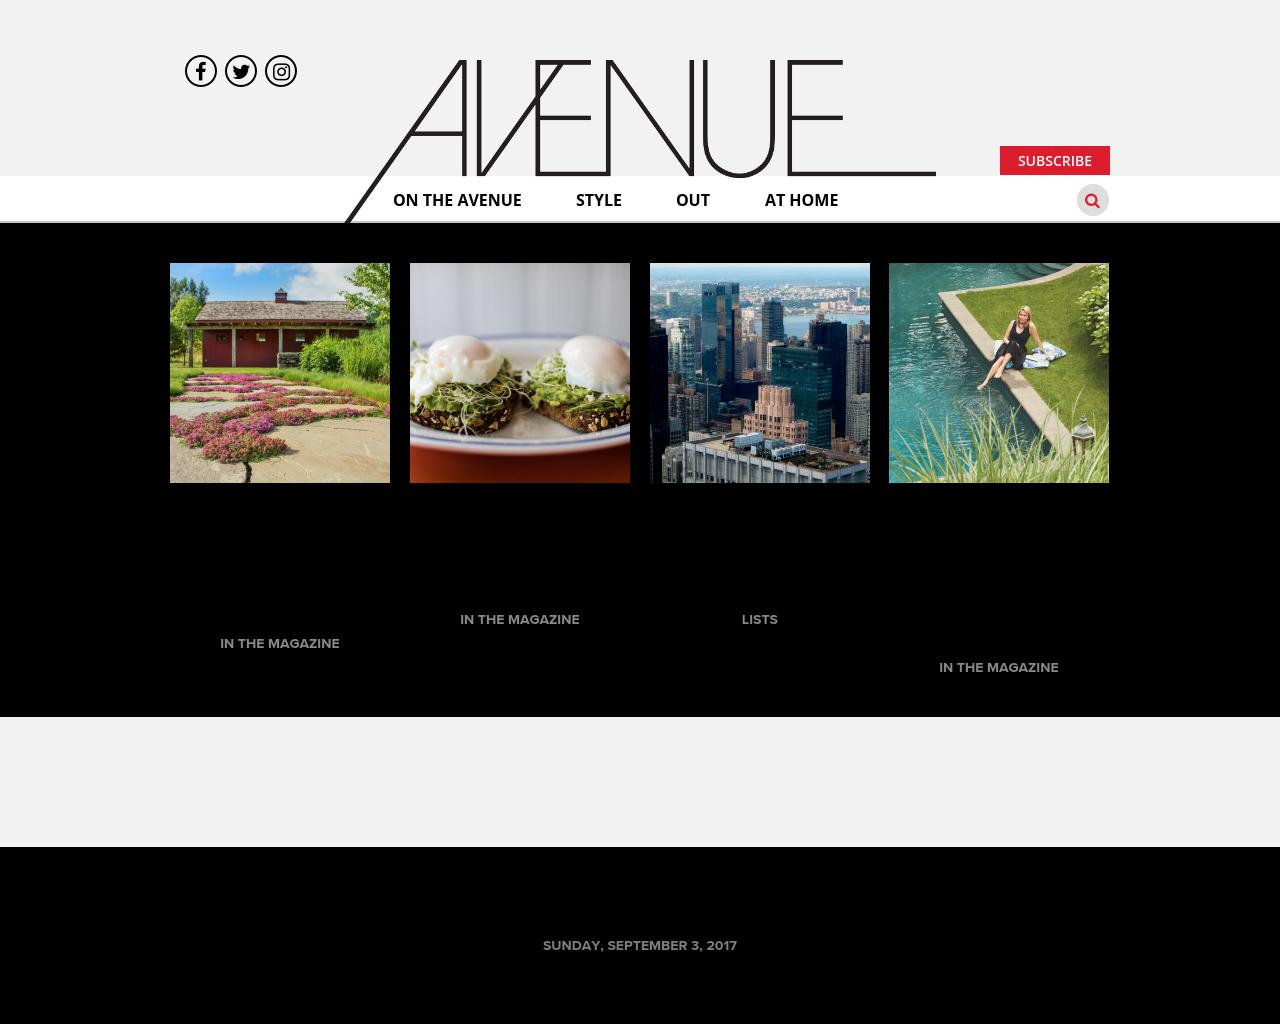 AVENUE-Magazine-Advertising-Reviews-Pricing